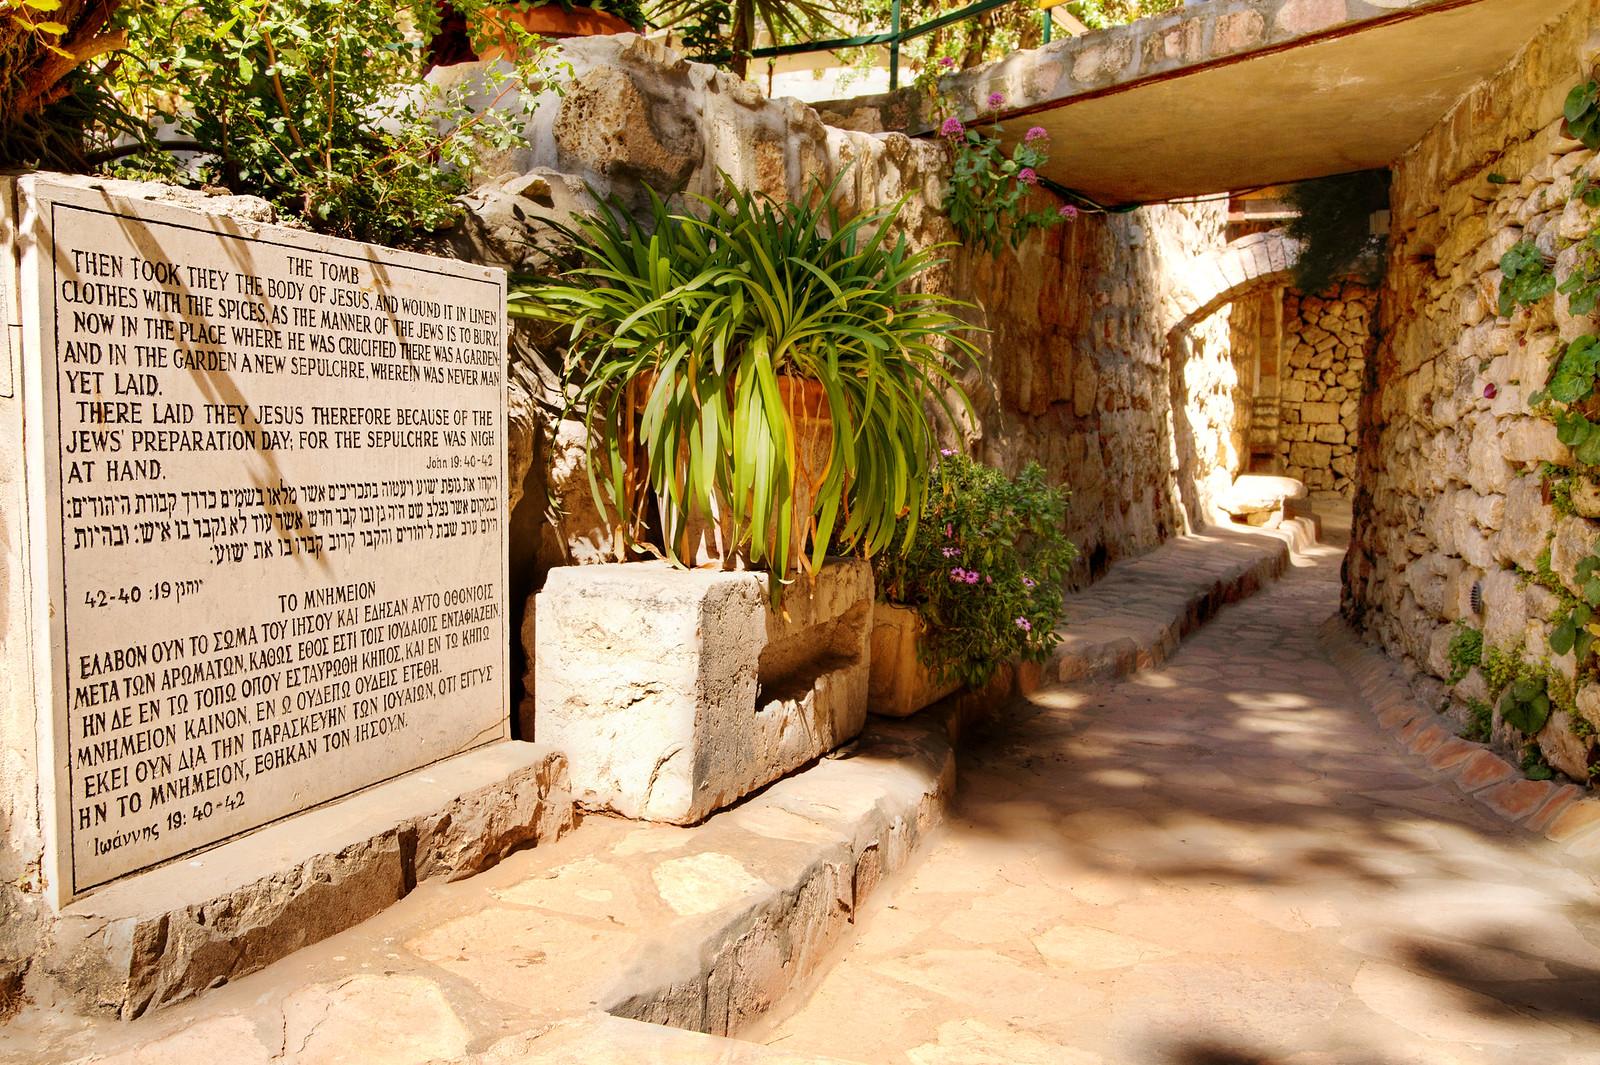 Jerusalem_Garden Tomb 3_Noam Chen_IMOT